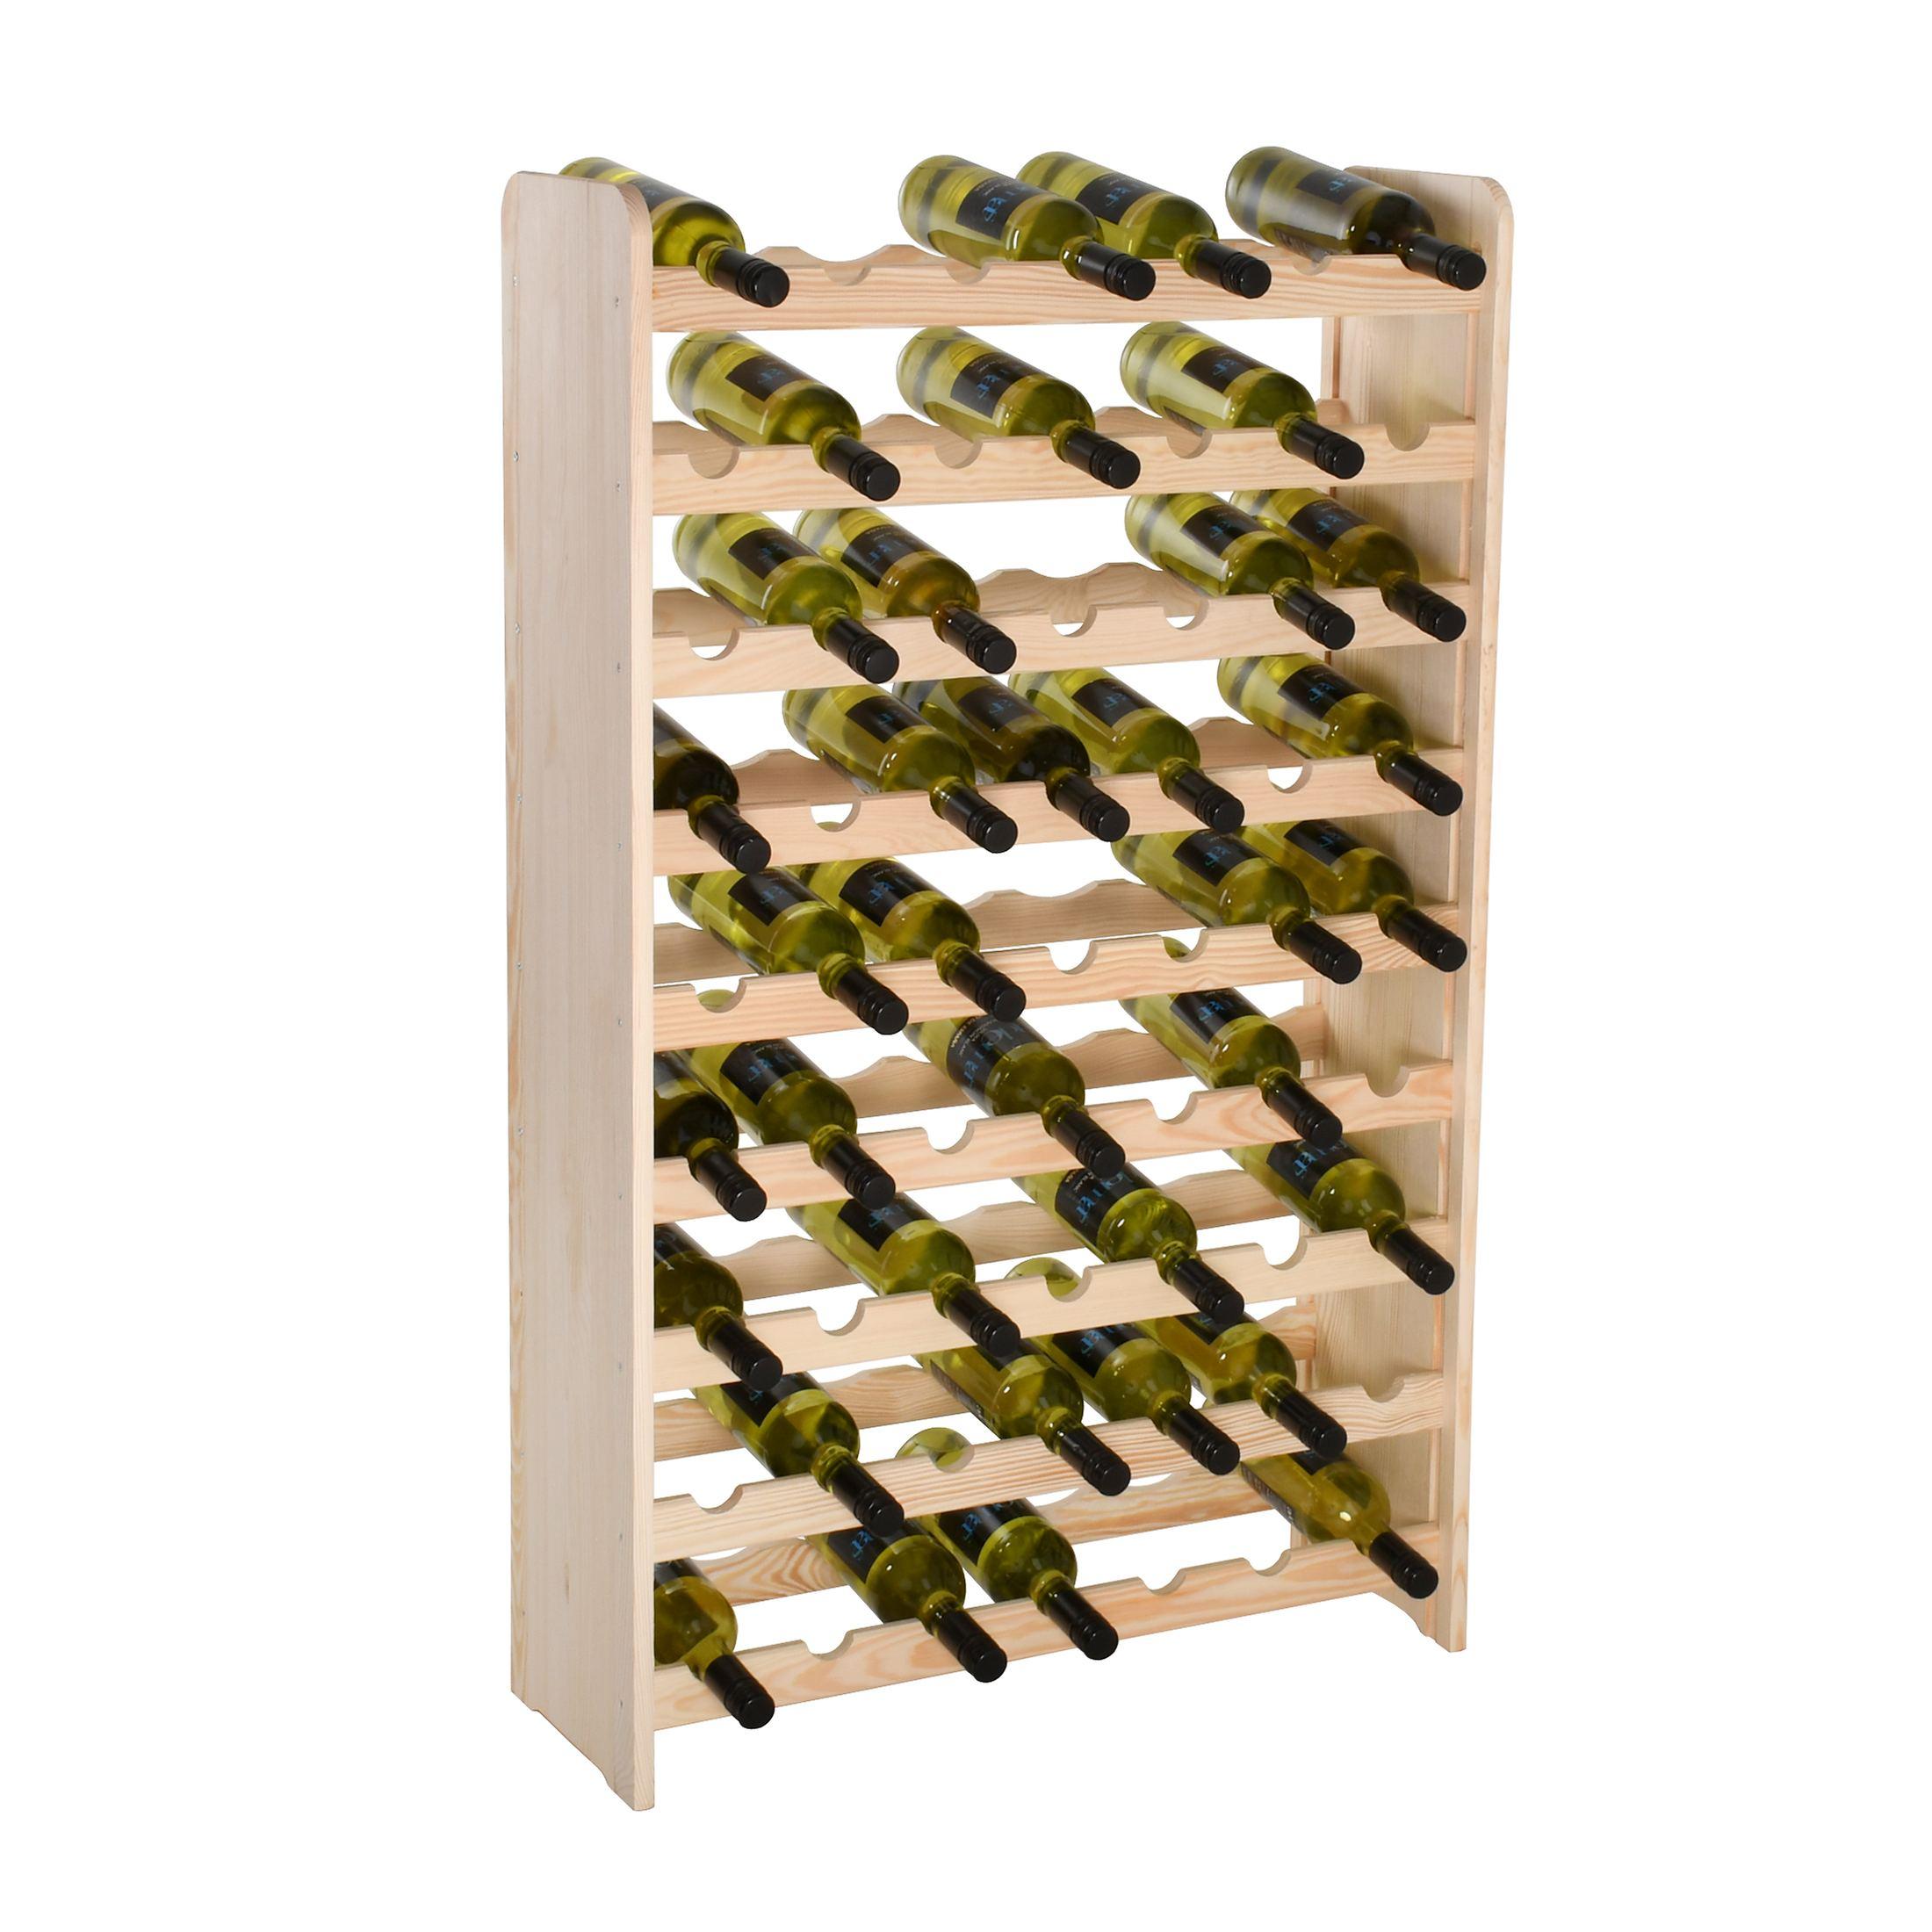 Weinregal-Flaschenregal-System-034-034-Optiplus-034-034-Holz-Kiefer-Natur